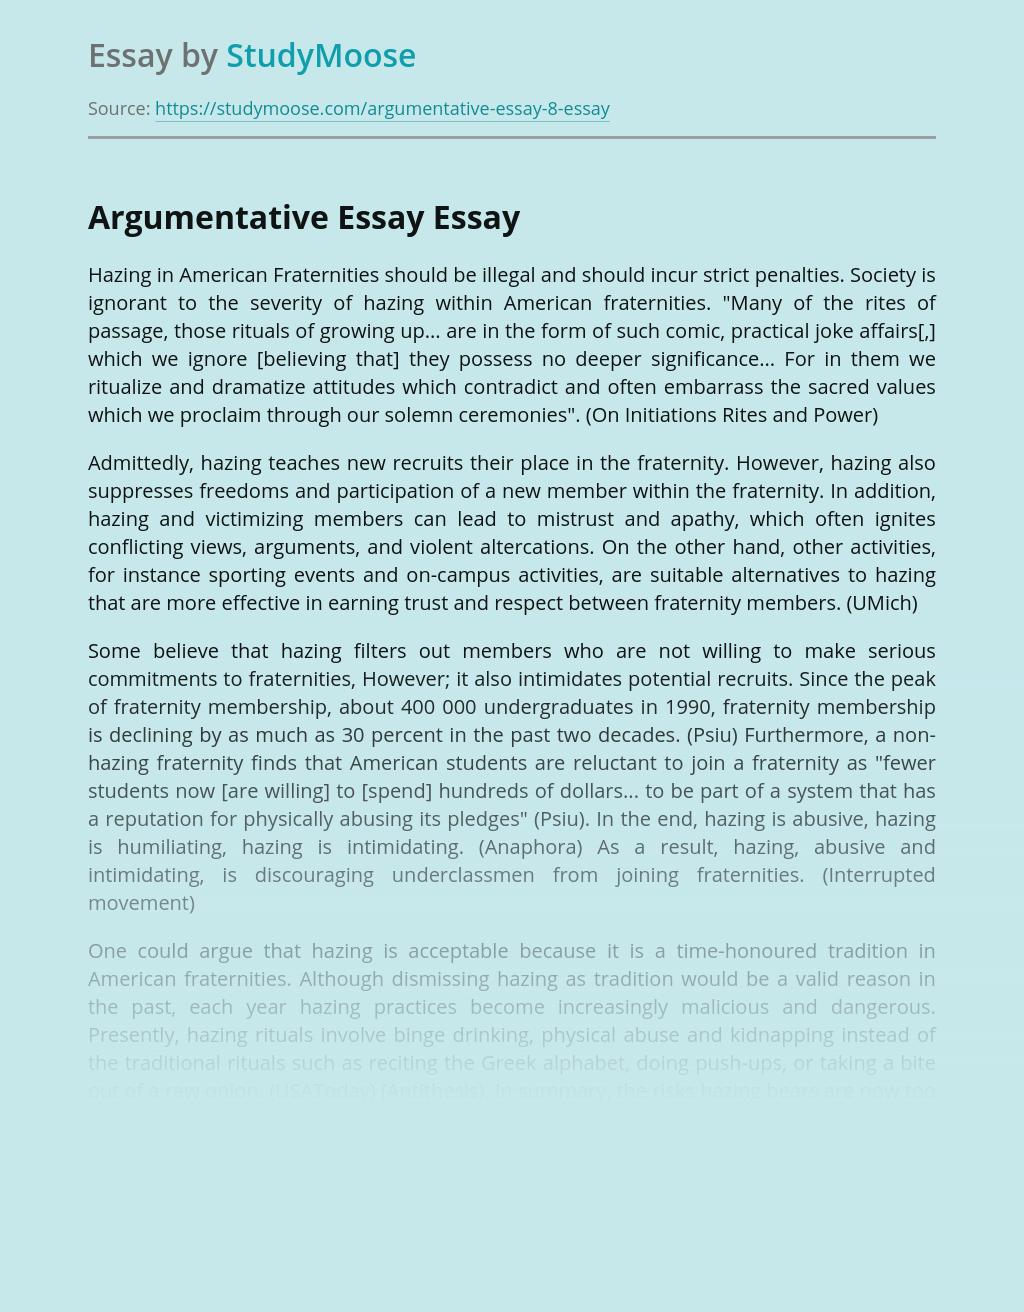 Argumentative Essay on Prohibition of Hazing